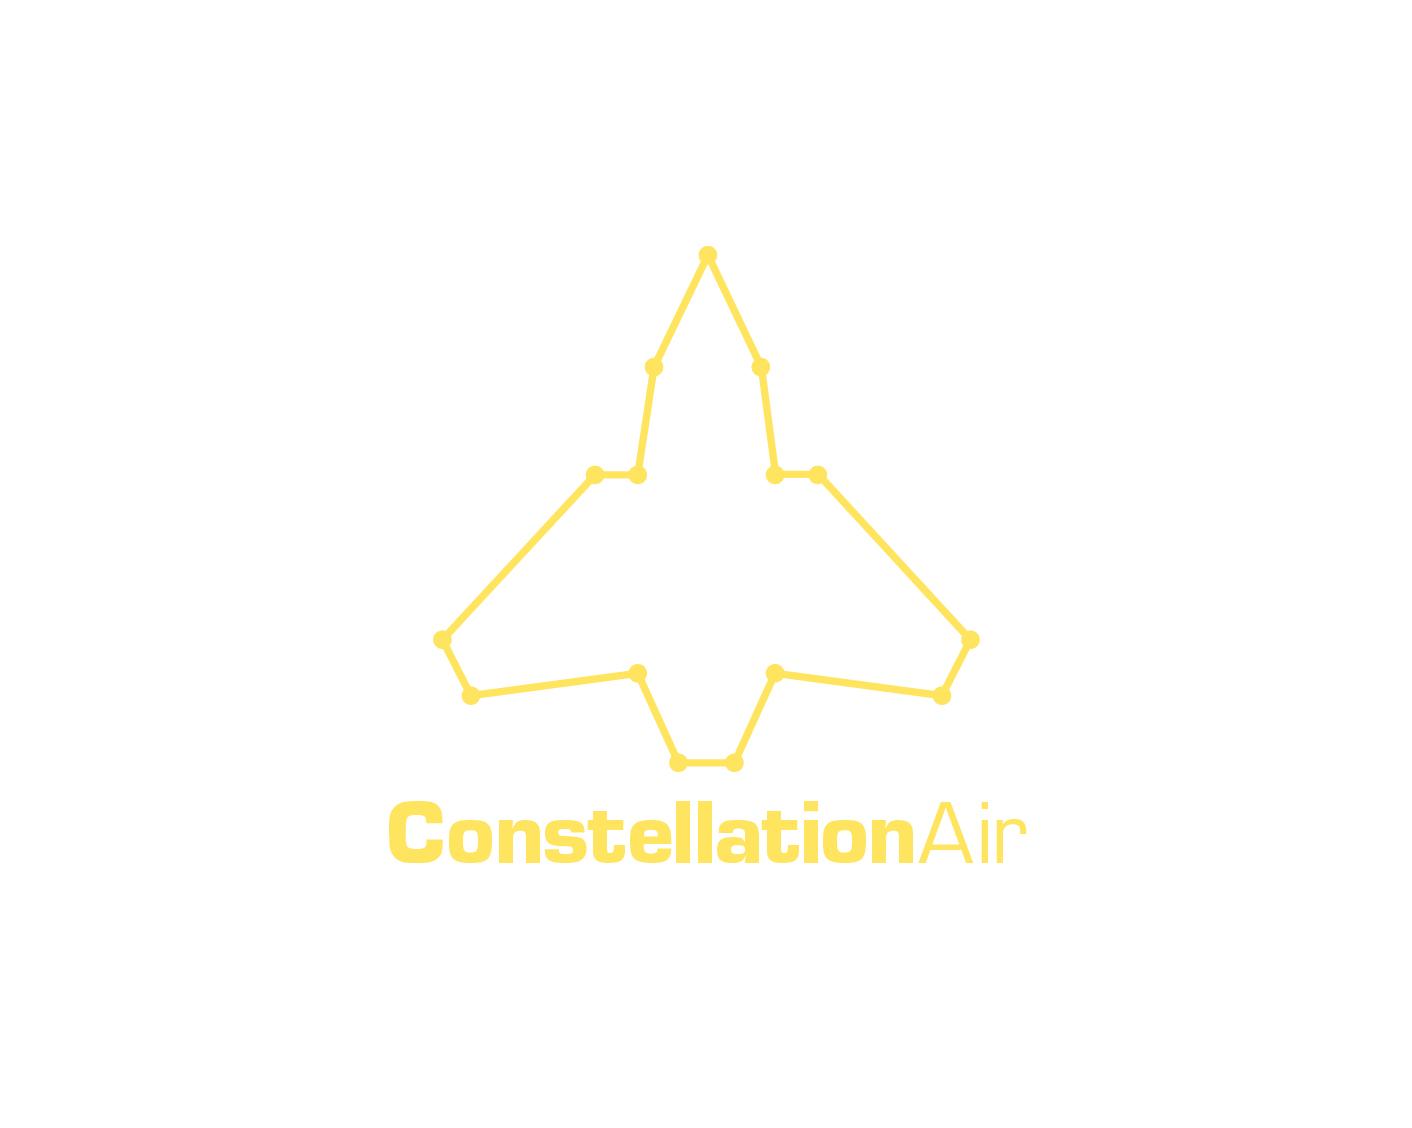 constellationairlogo-02.jpg